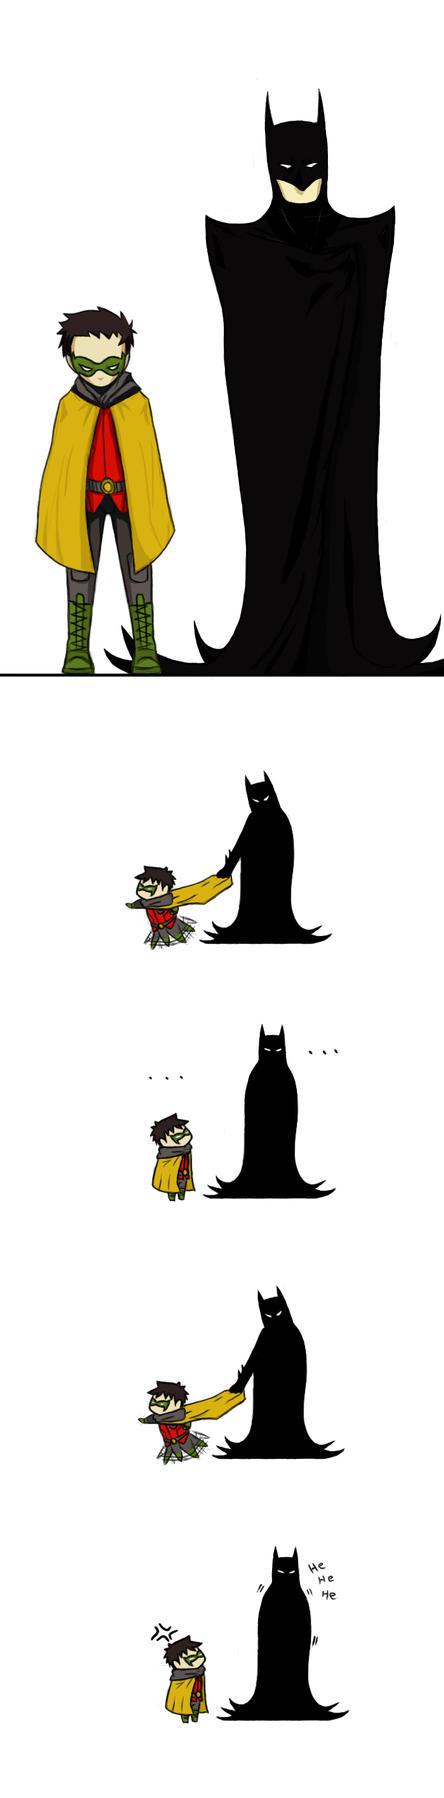 Batman: The New Duo by CrimsonHorror